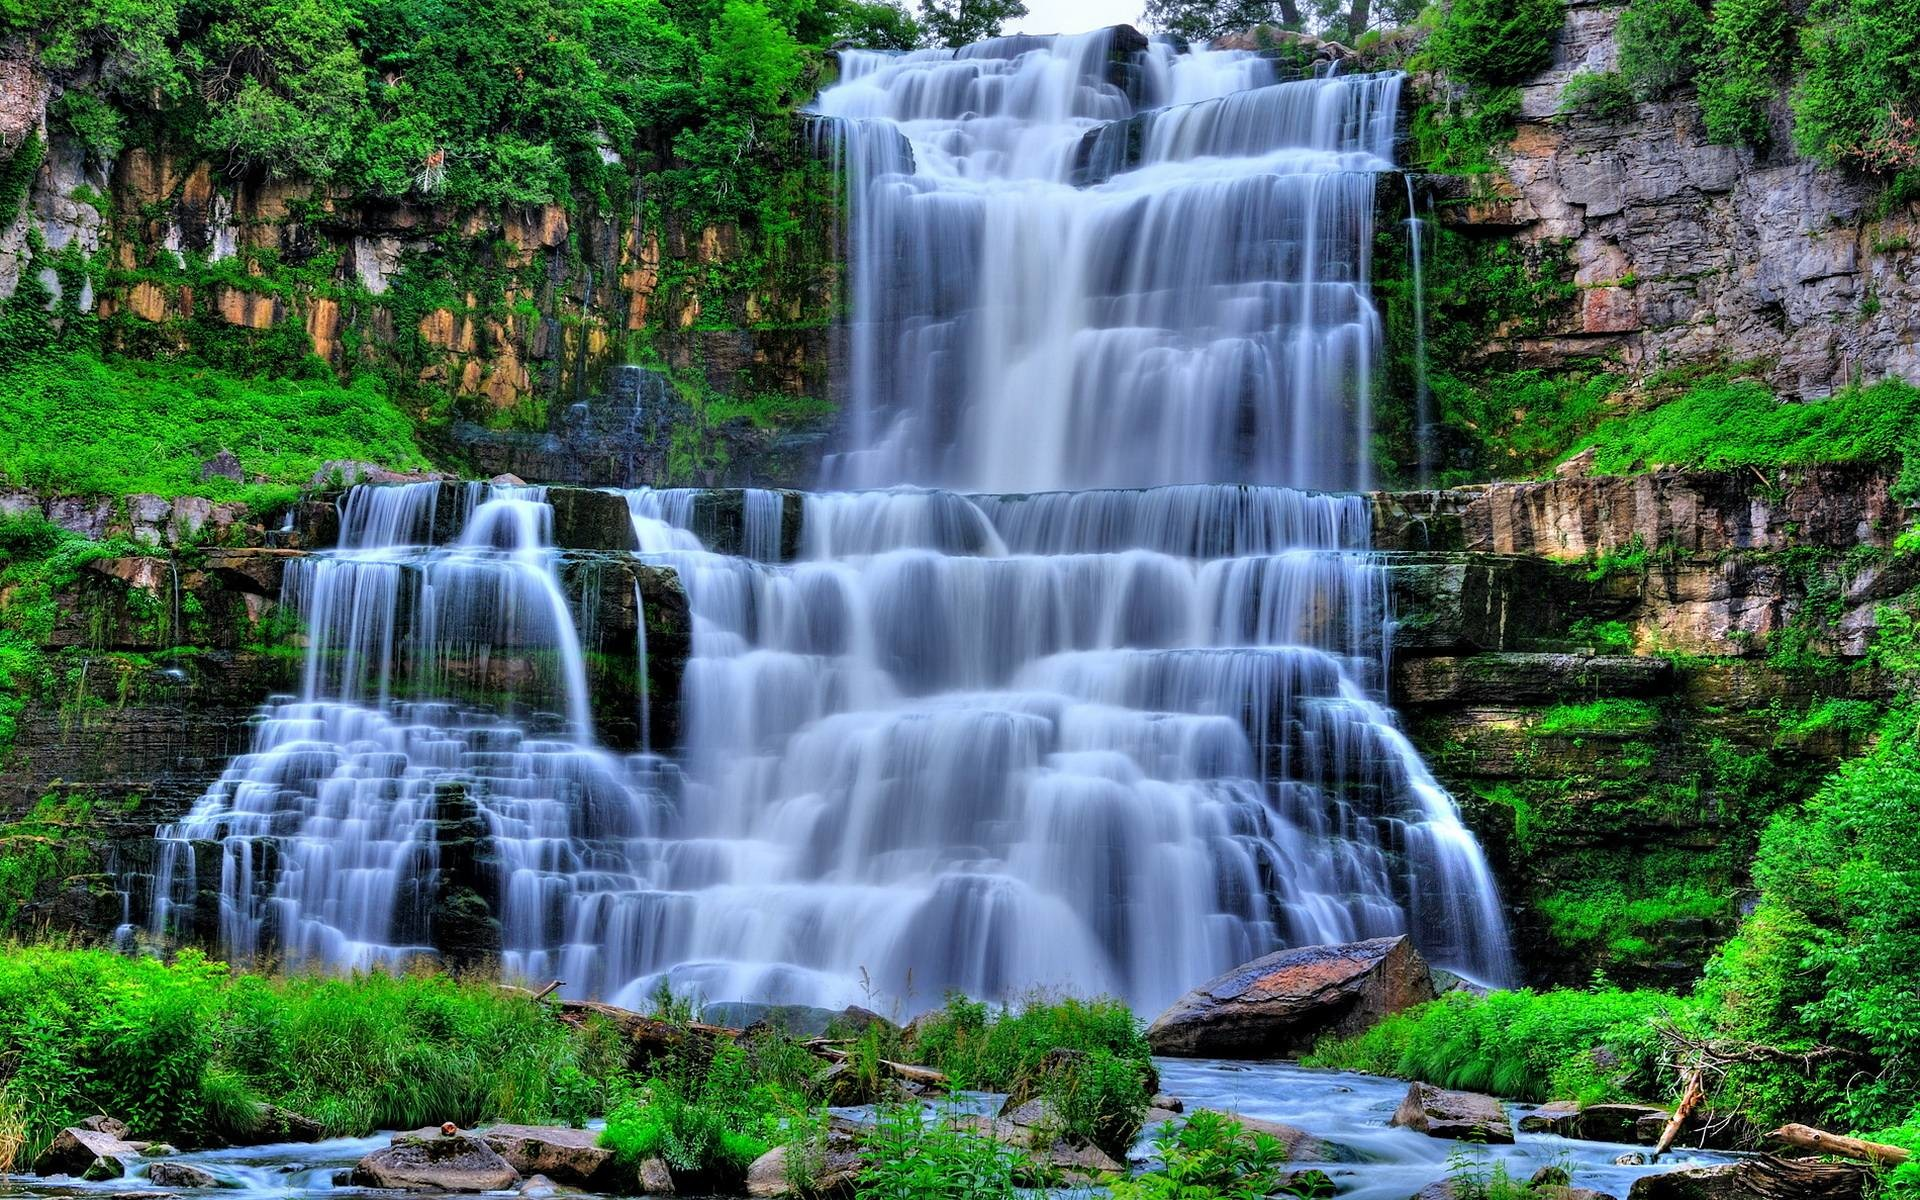 Waterfall Wallpapers – Full HD wallpaper search